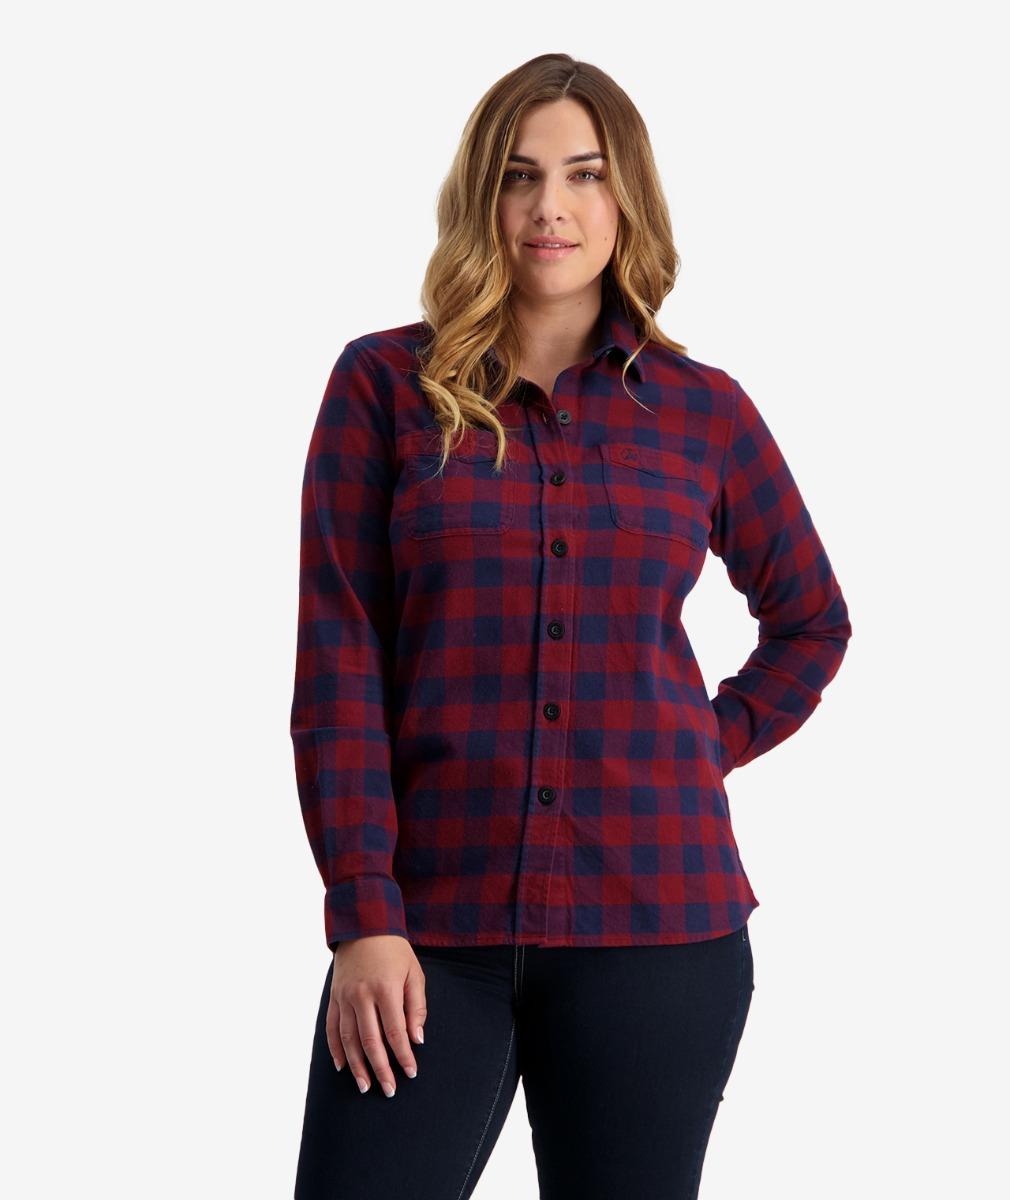 Women's Taranaki Tailor Long Sleeve Cotton Work Shirt